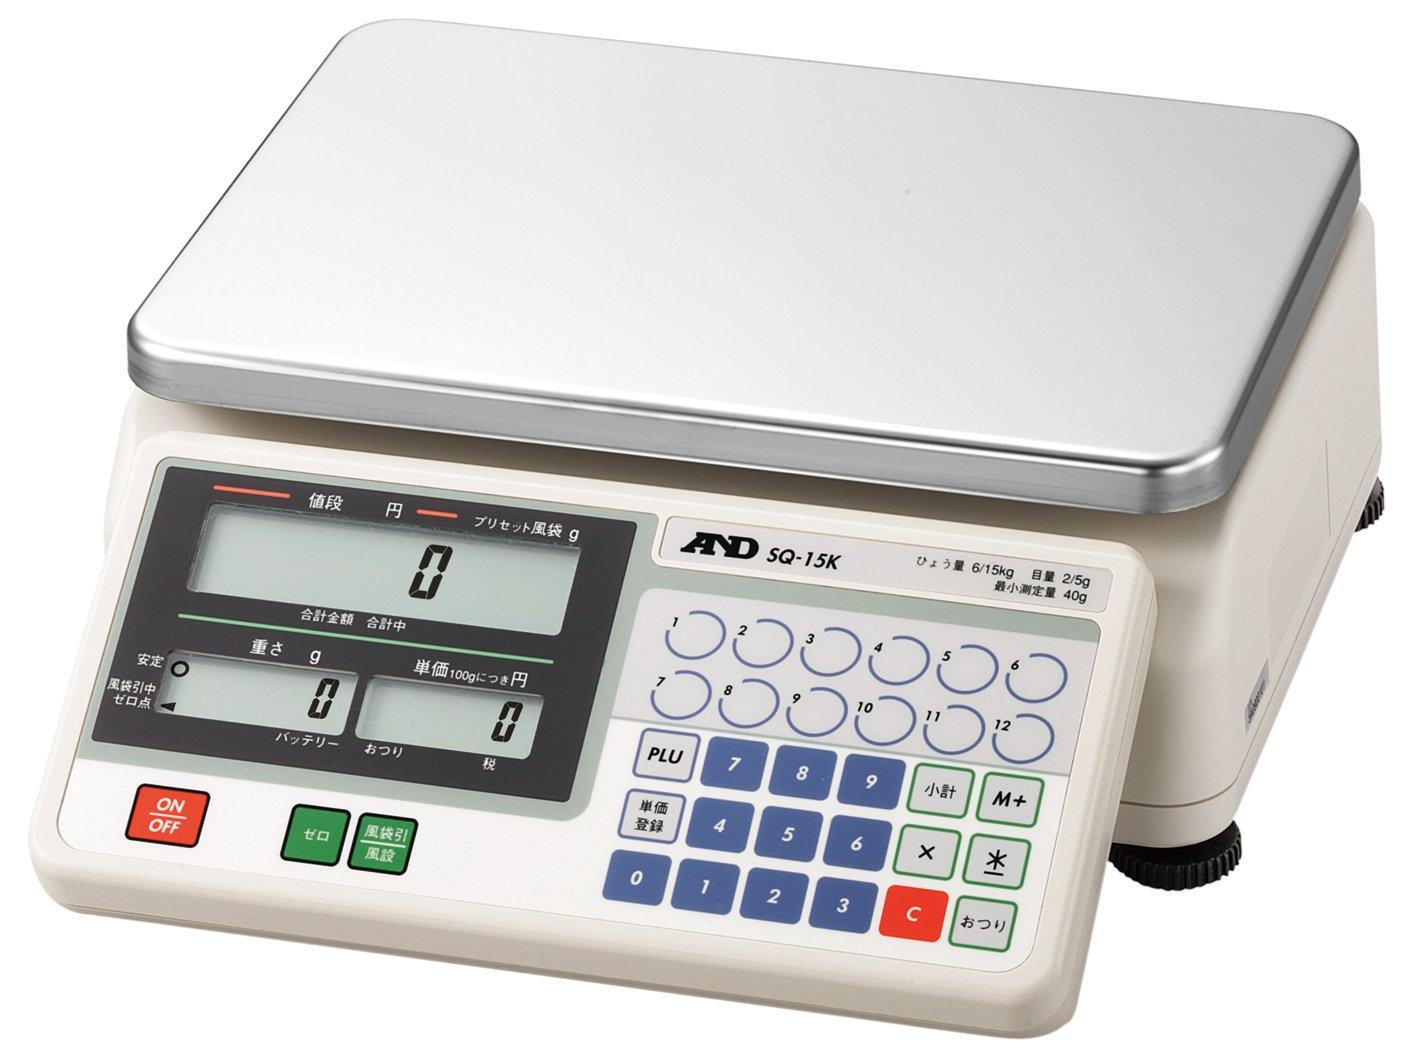 A&D 検定付き店舗用料金はかり SQ-15K ひょう量:15000g 最小表示:2~5g(使用範囲:40~15000g) 皿寸法:300(W)*210(D) mm 検定付:5地域 使用地域区分:5区 B0734B1DF6